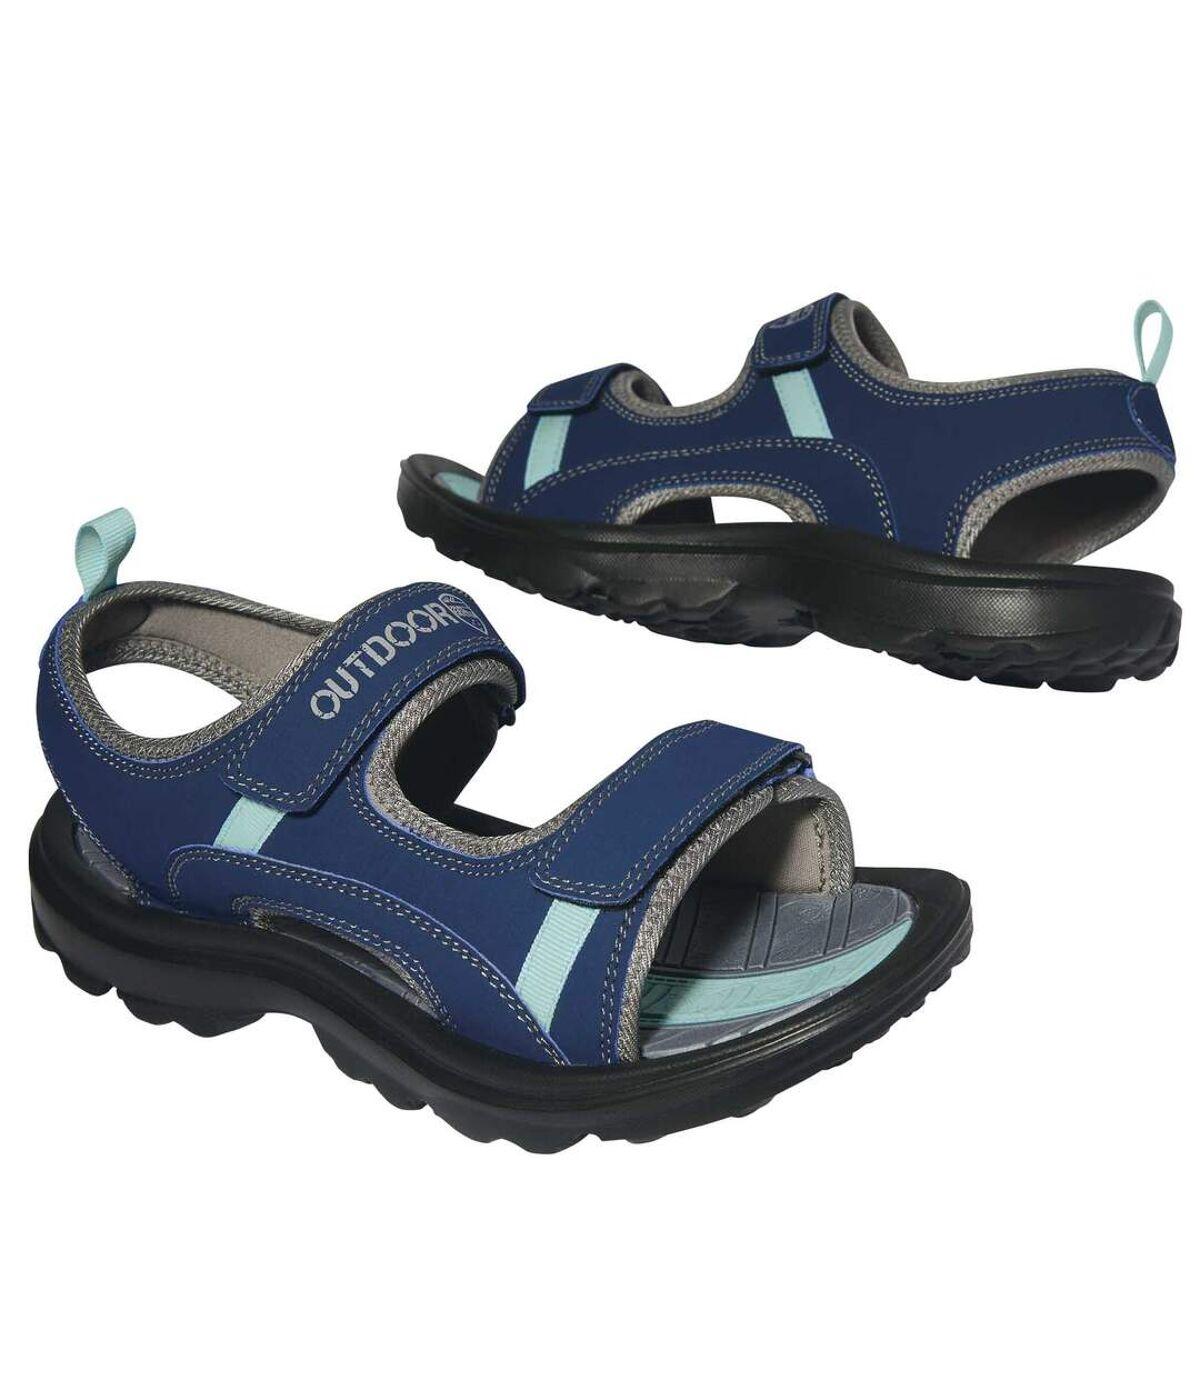 Outdoorové sandály Summer Trip Atlas For Men